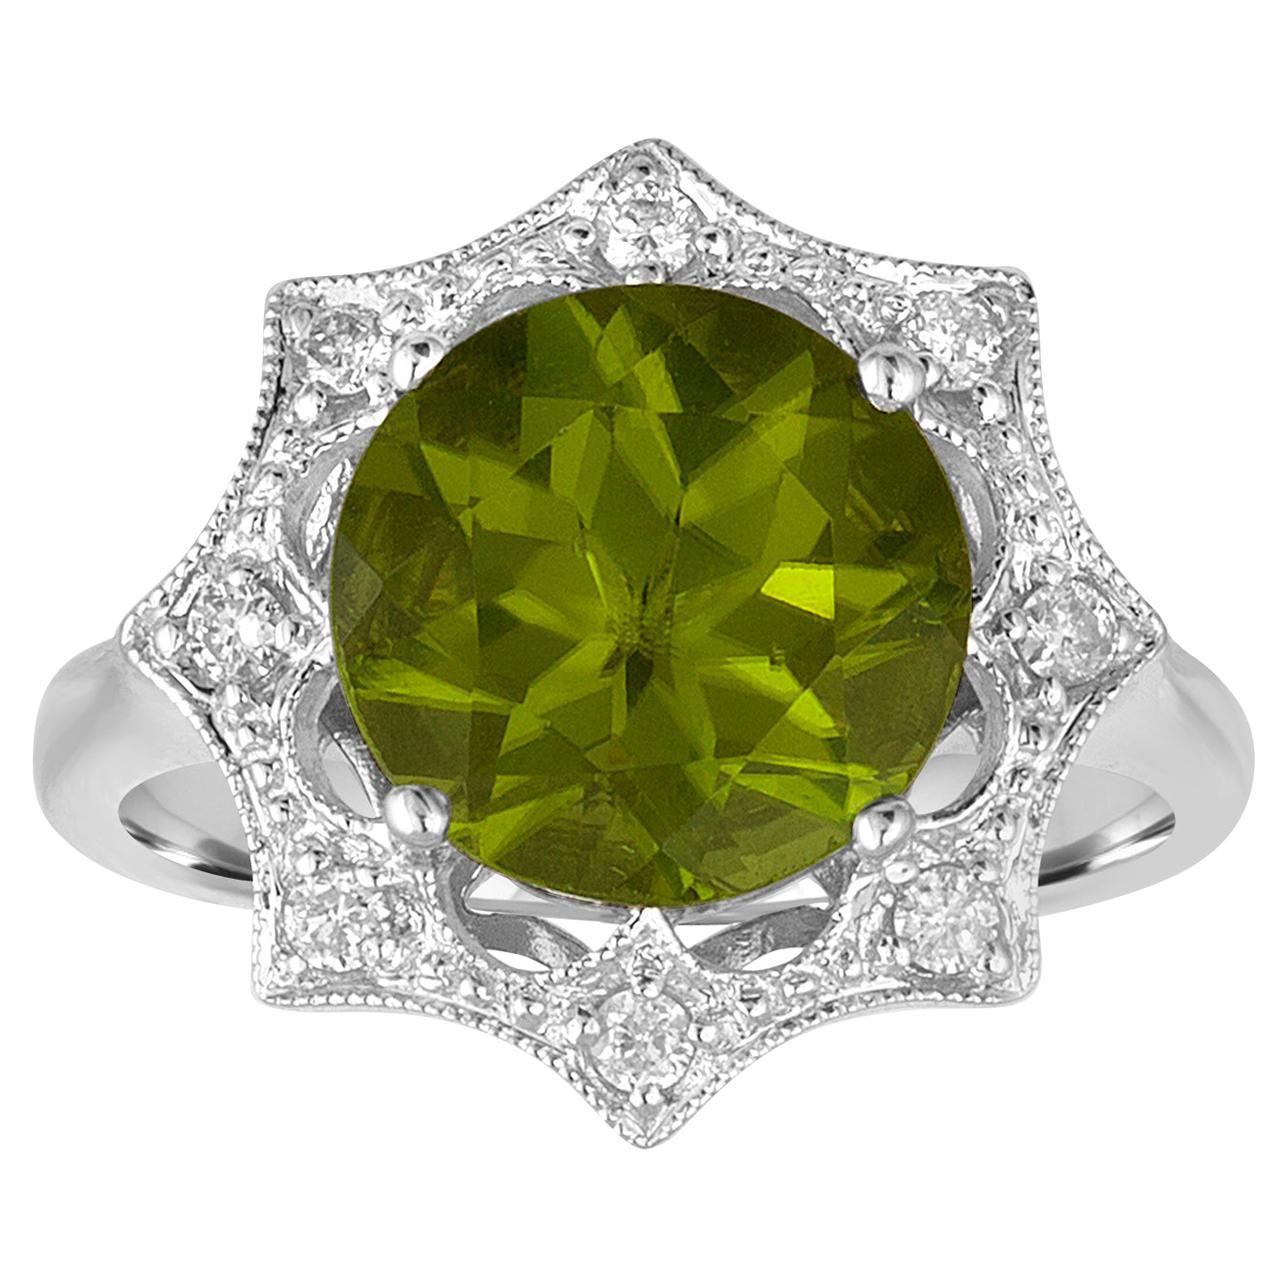 3.81 Carat Round Peridot and Diamond Gold Ring